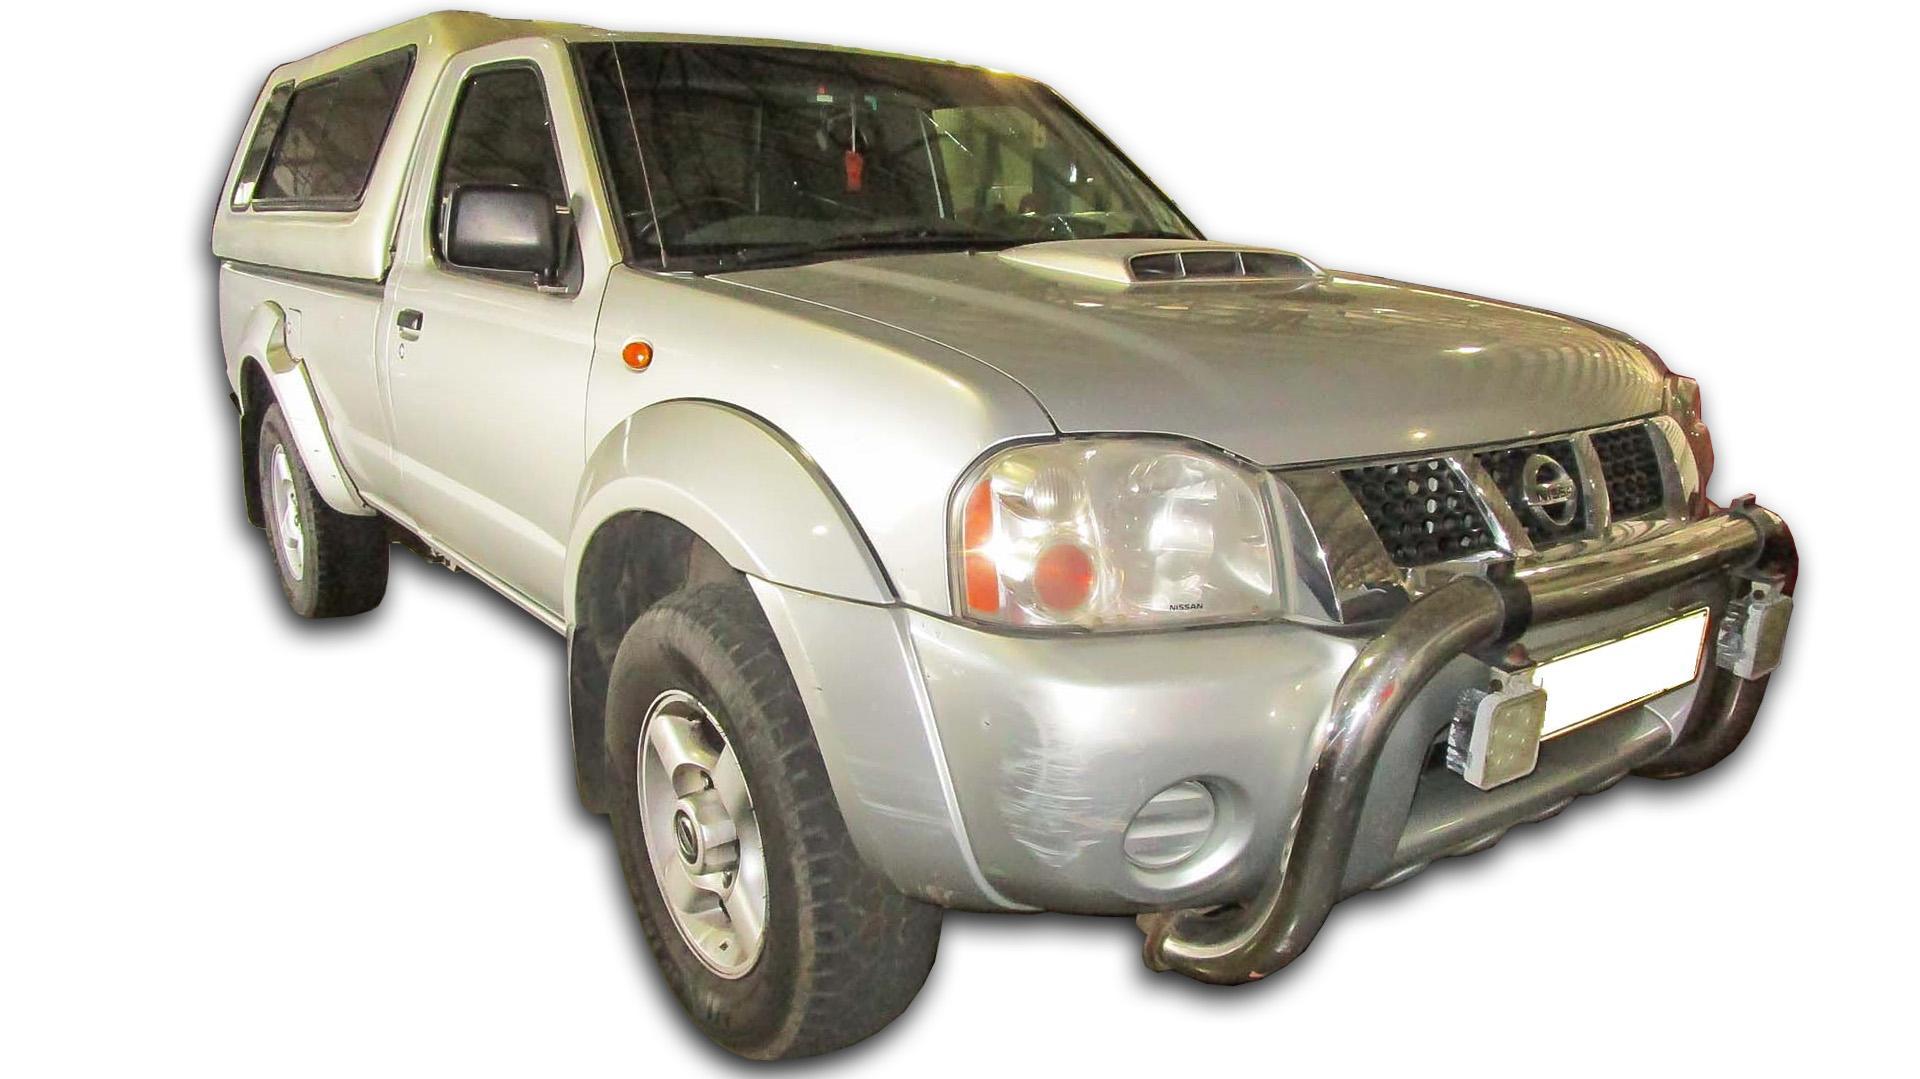 Nissan Hardbody NP300 2.5TD